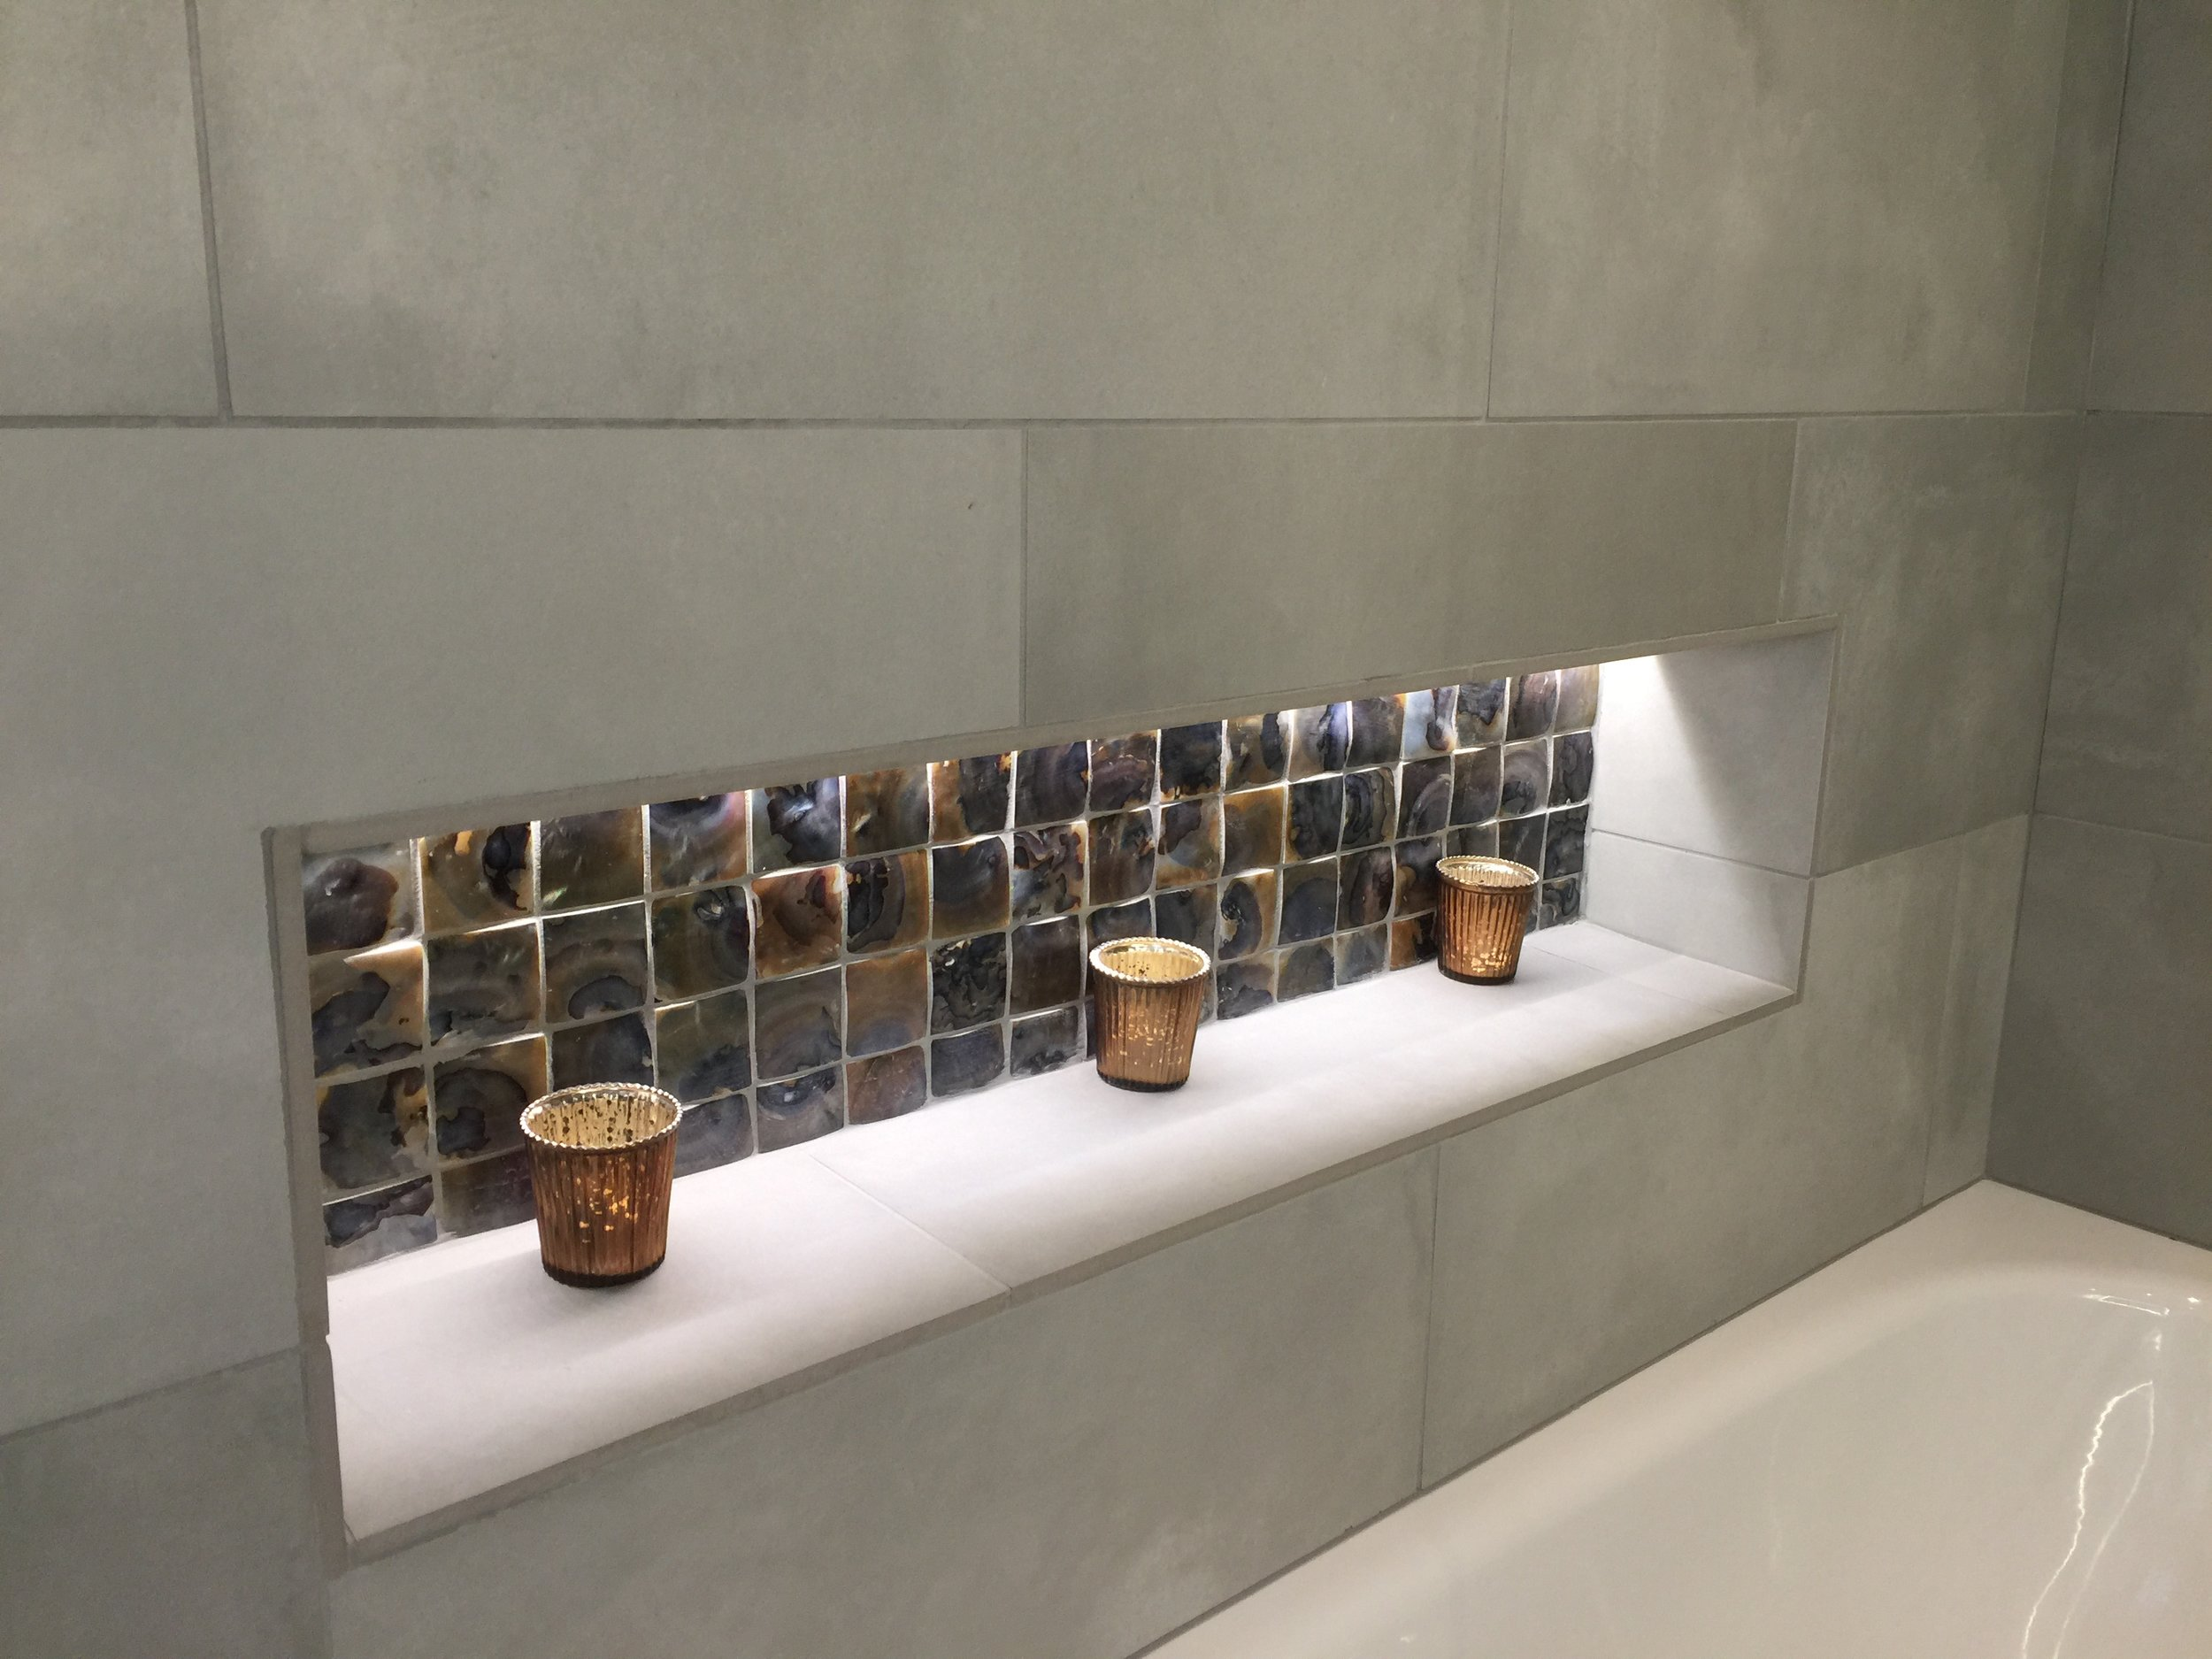 Bathroom design -     Normal.dotm  0  0  1  34  196  Mimos Interiors  1  1  240  12.0             0  false      18 pt  18 pt  0  0    false  false  false                       /* Style Definitions */ table.MsoNormalTable {mso-style-name: